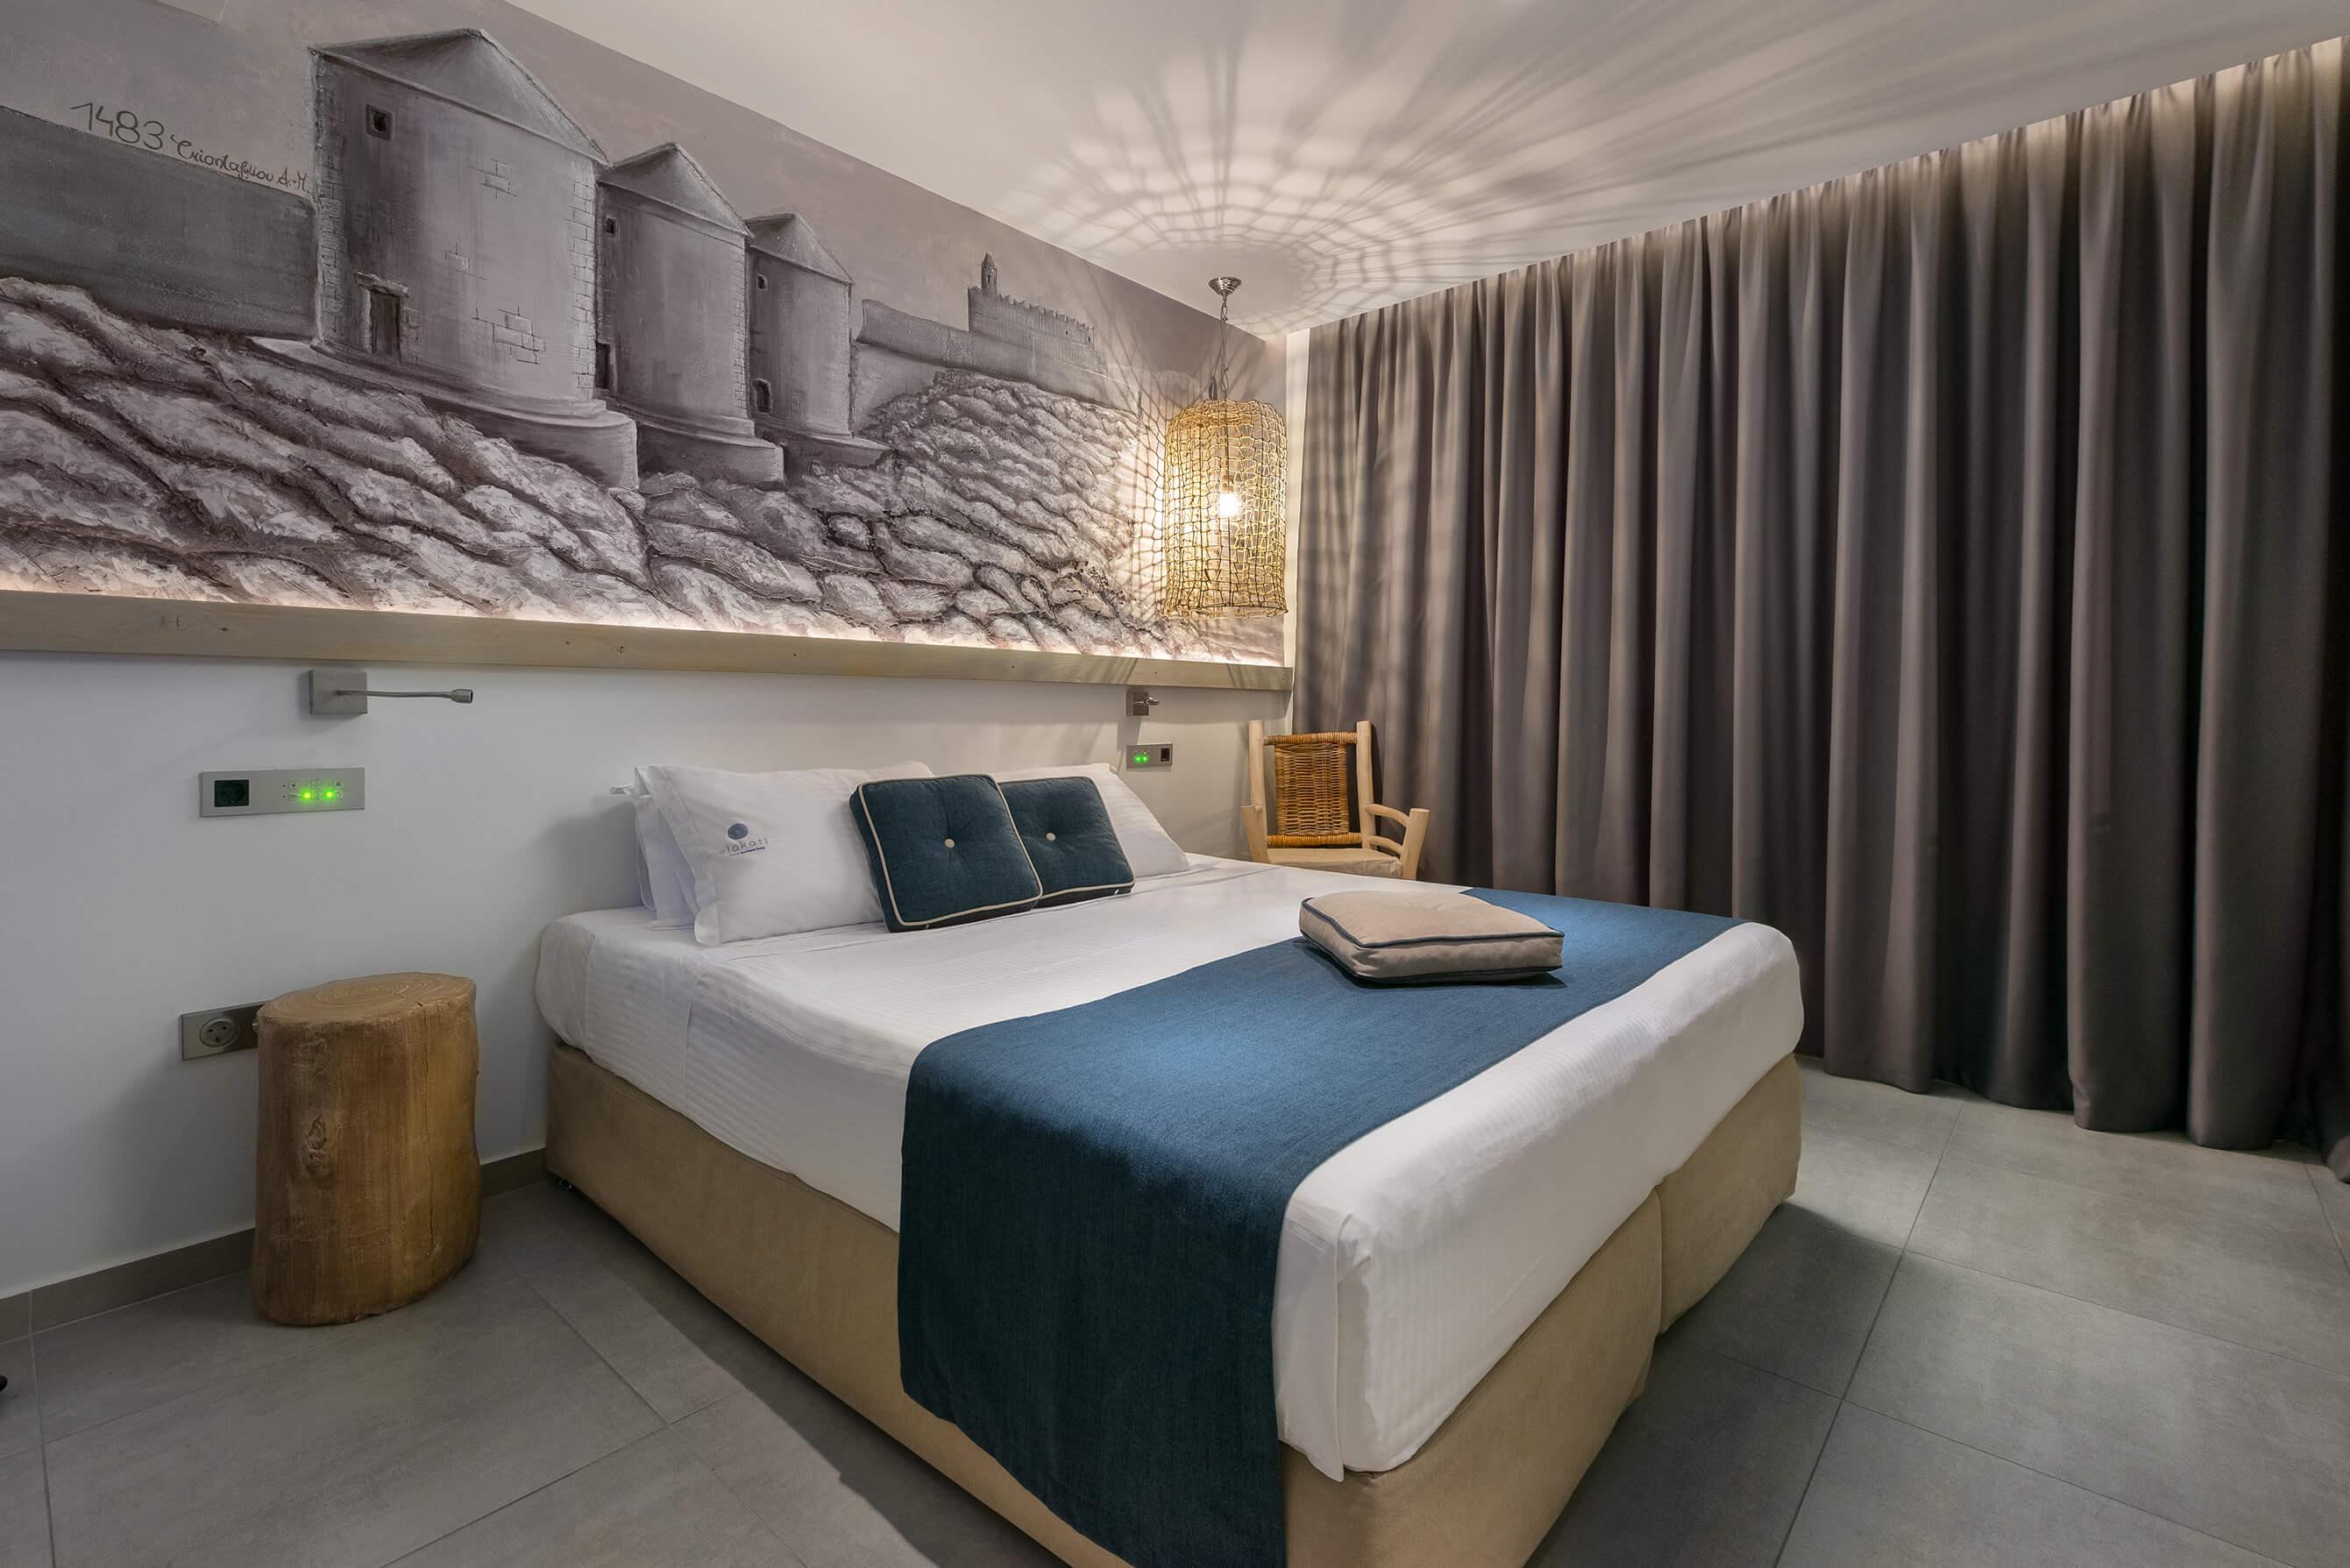 Milos-Themed-Room-Elakati-Hotel-in-Rhodes-Greece